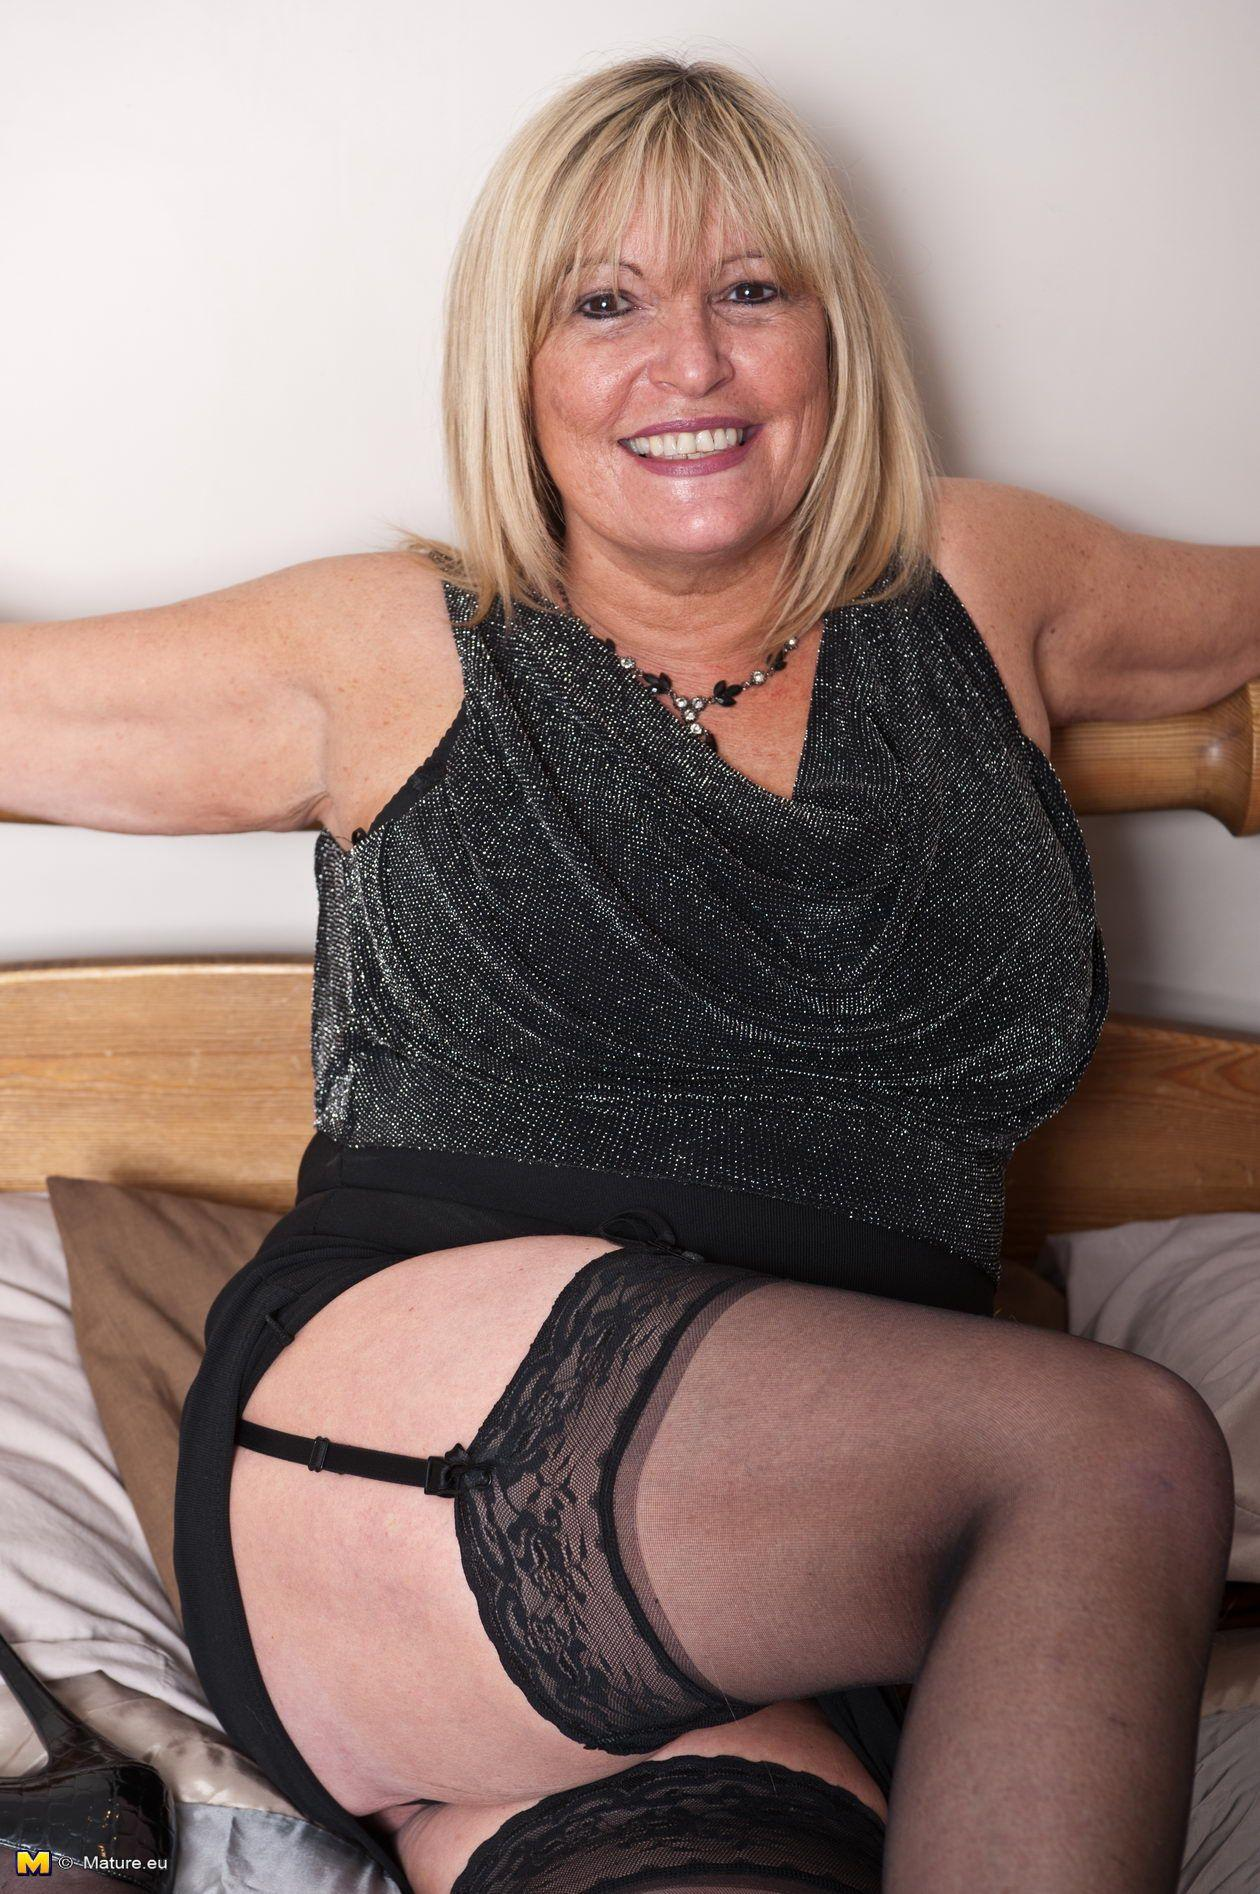 Blonde lady mature sex